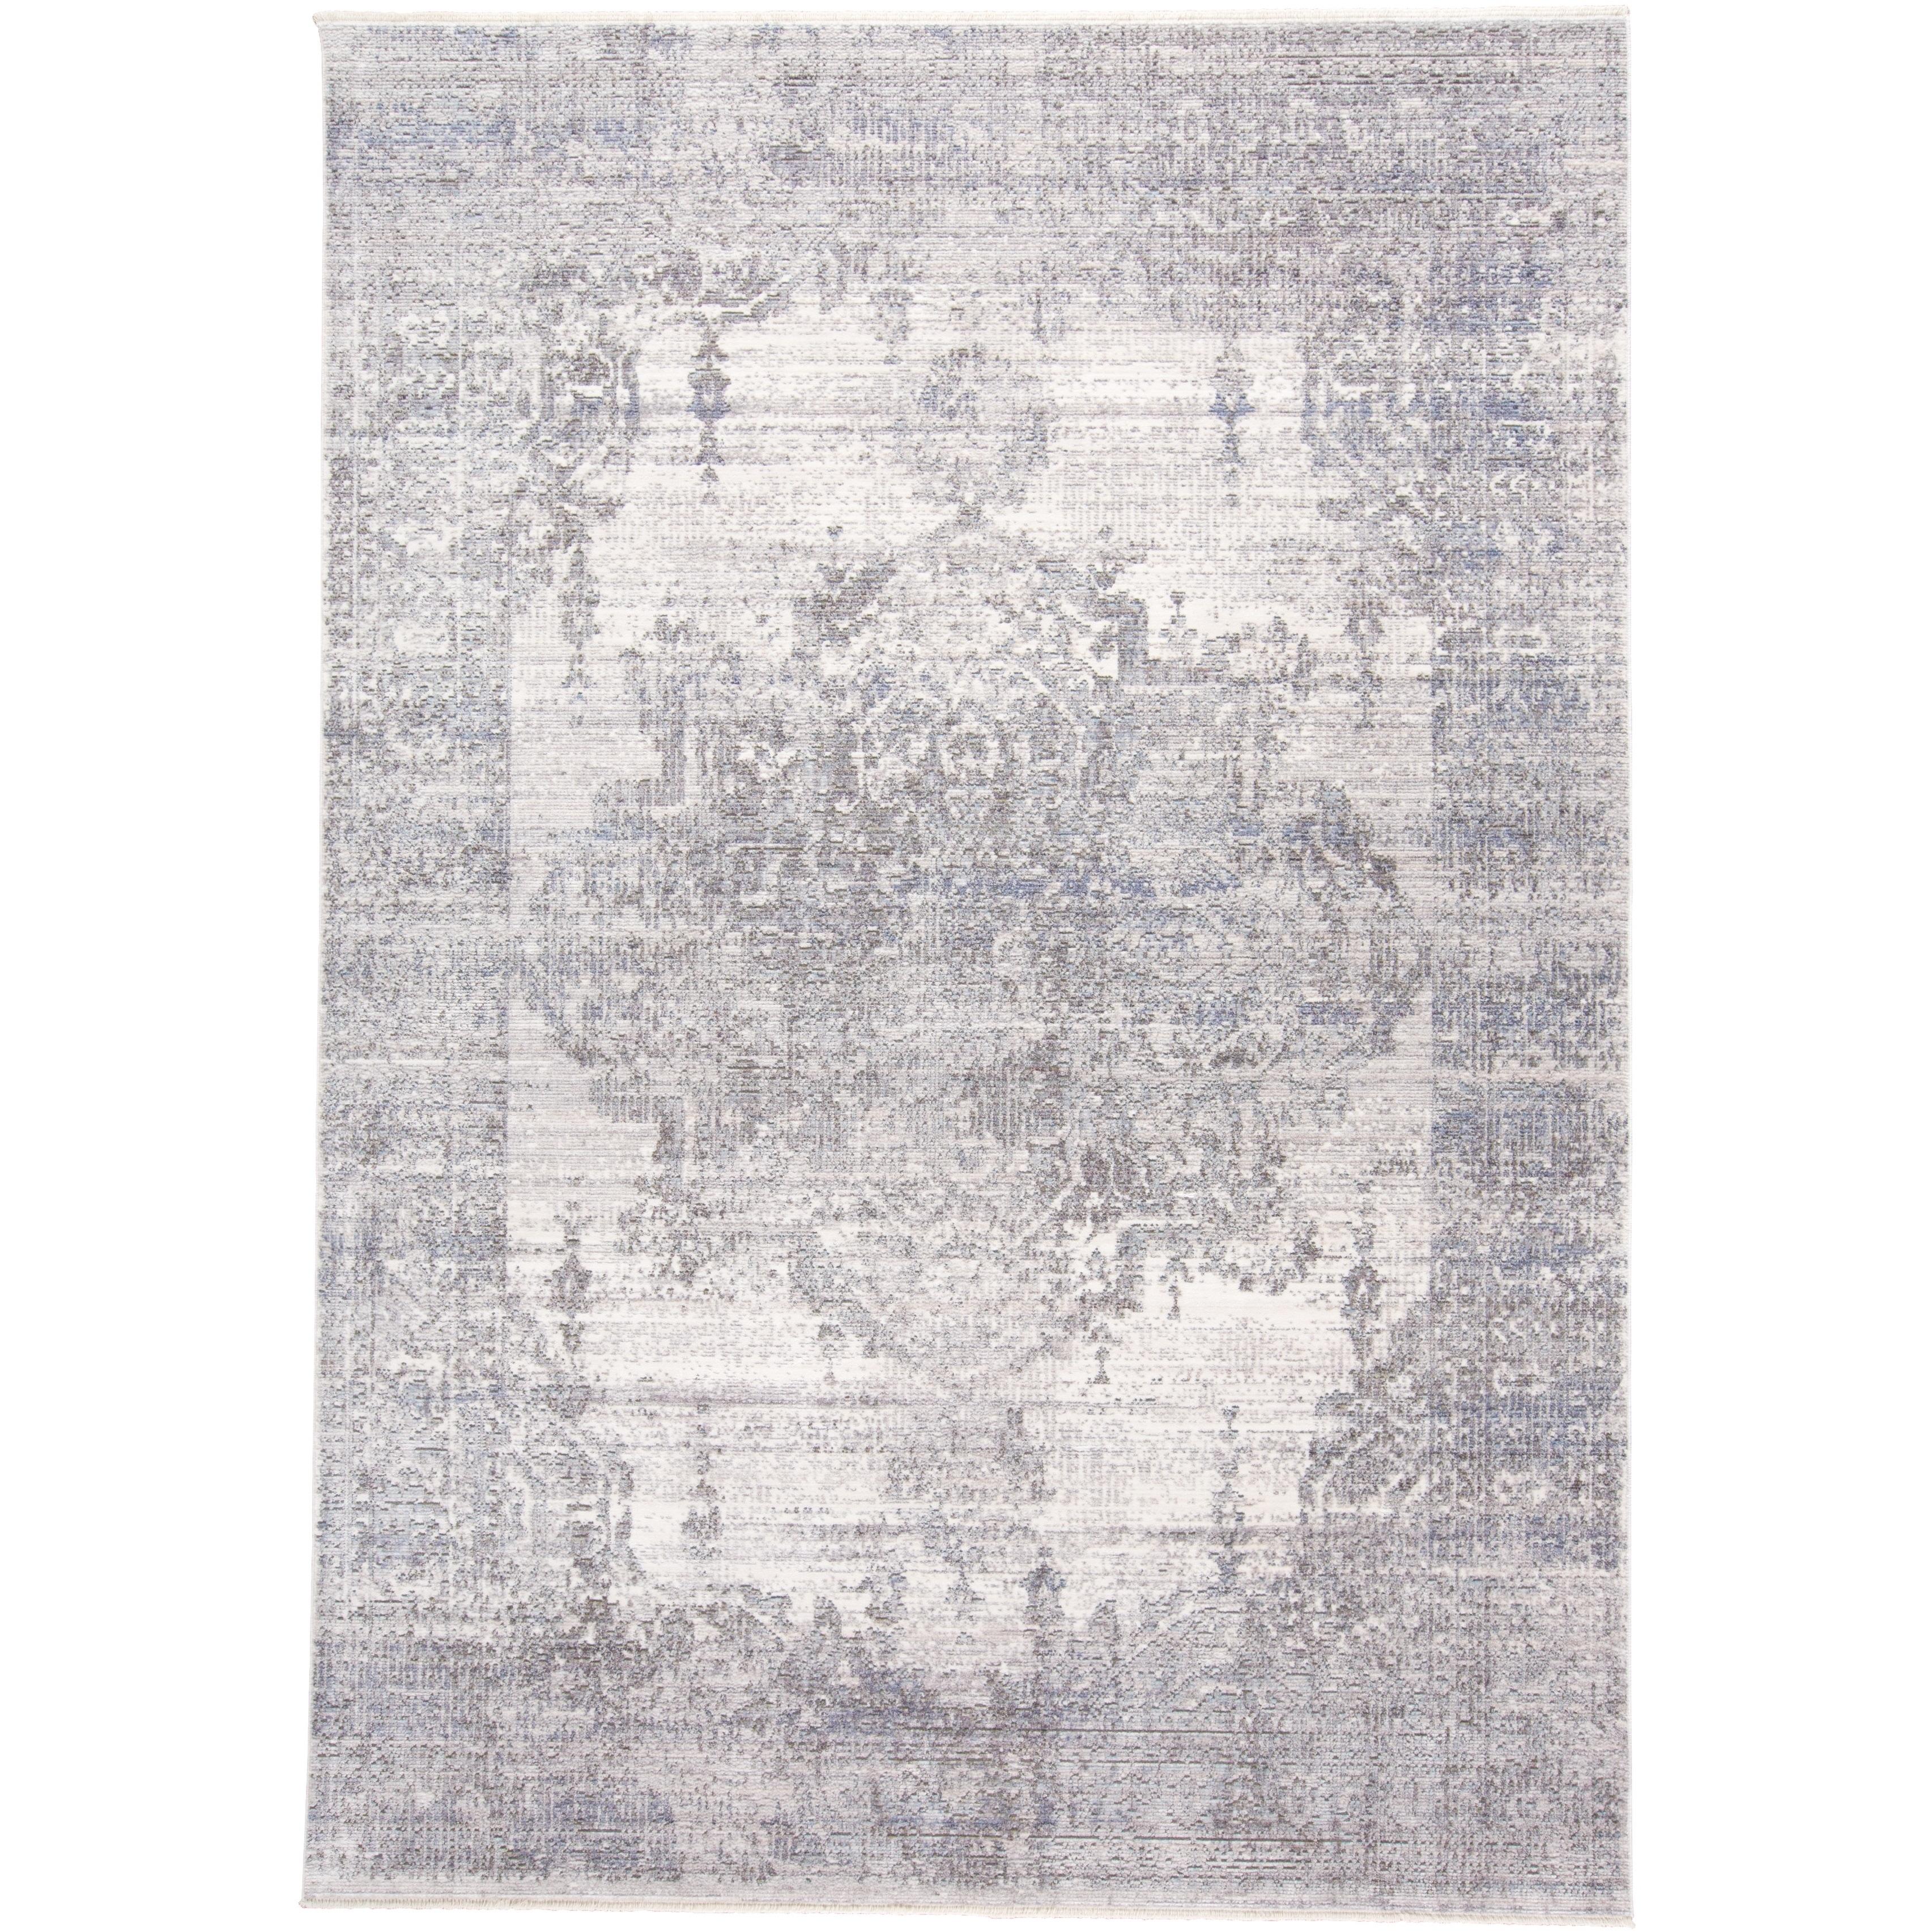 Grand Bazaar Tirza Gray Rug (3 x 5) - 3 x 5 (Grey - 3 x 5)